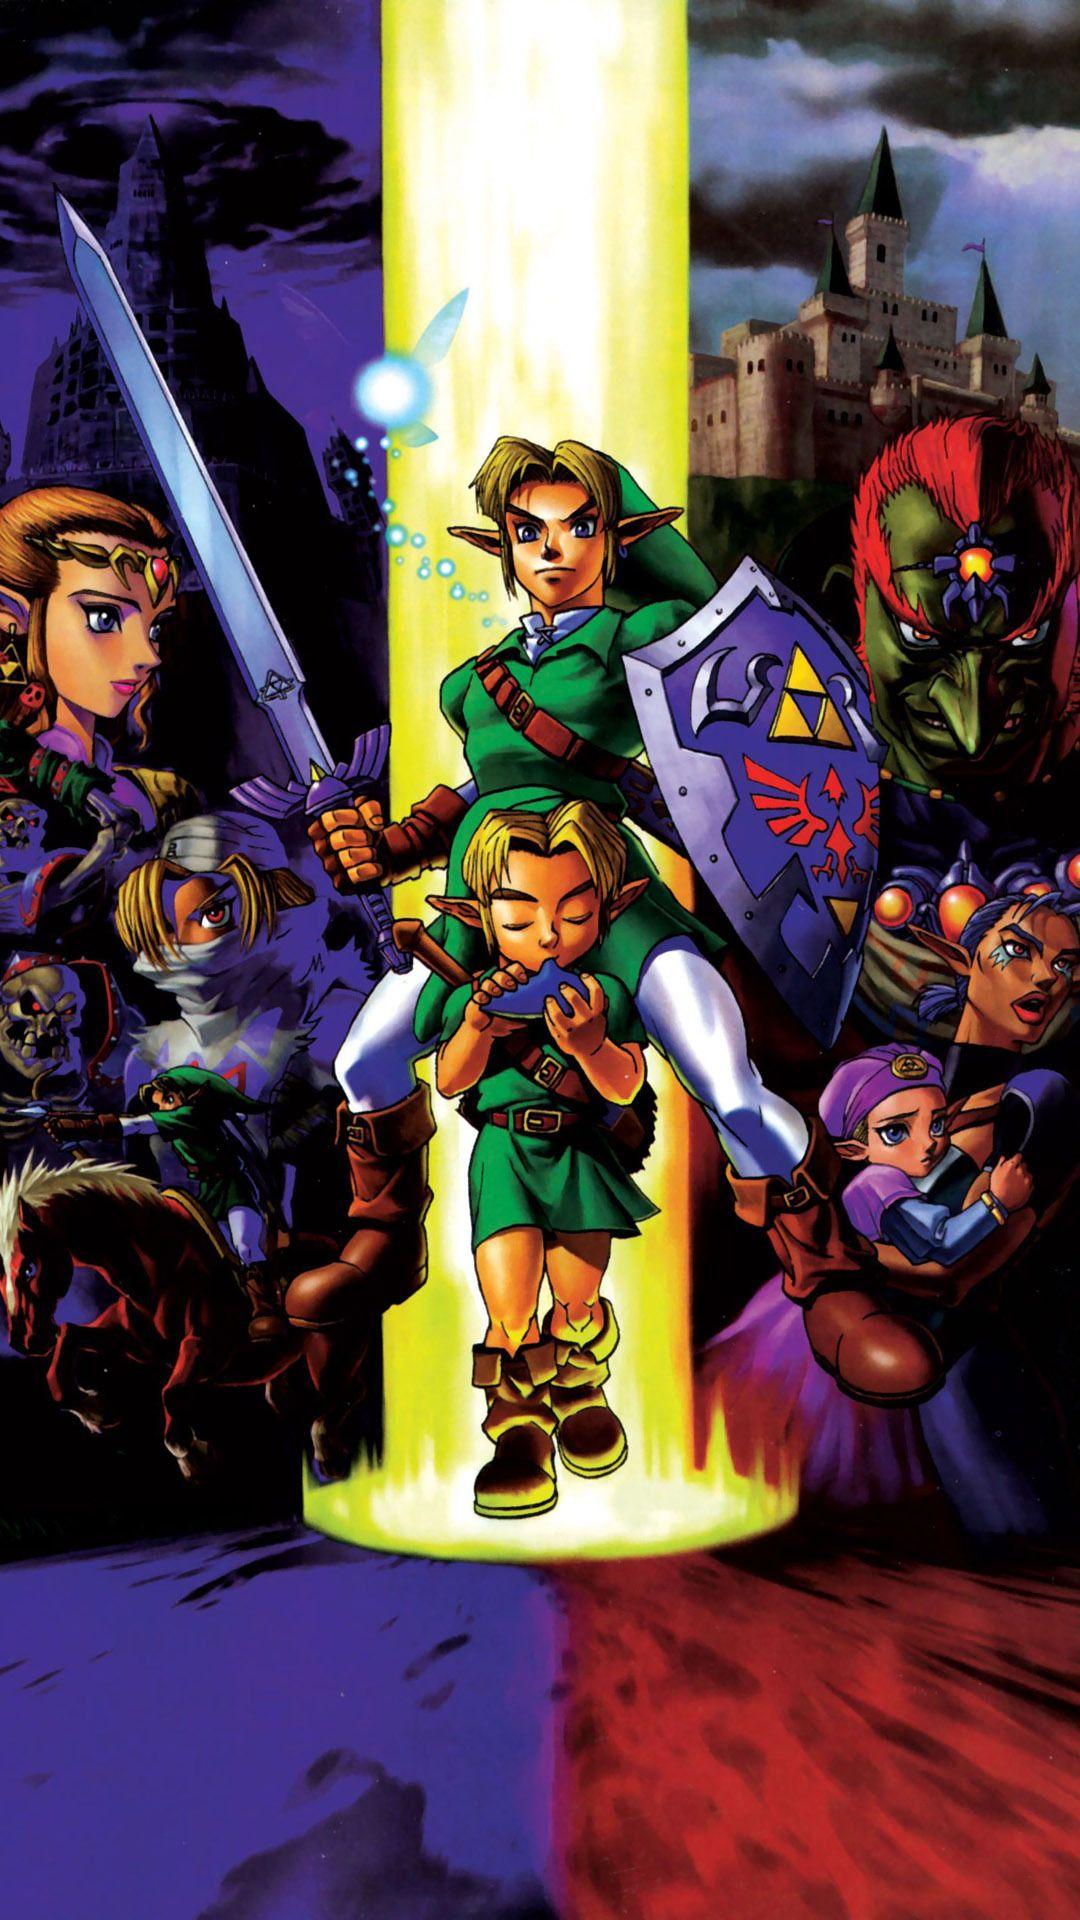 Legend Of Zelda Ocarina Of Time Mobile Phone Wallpapers Legend